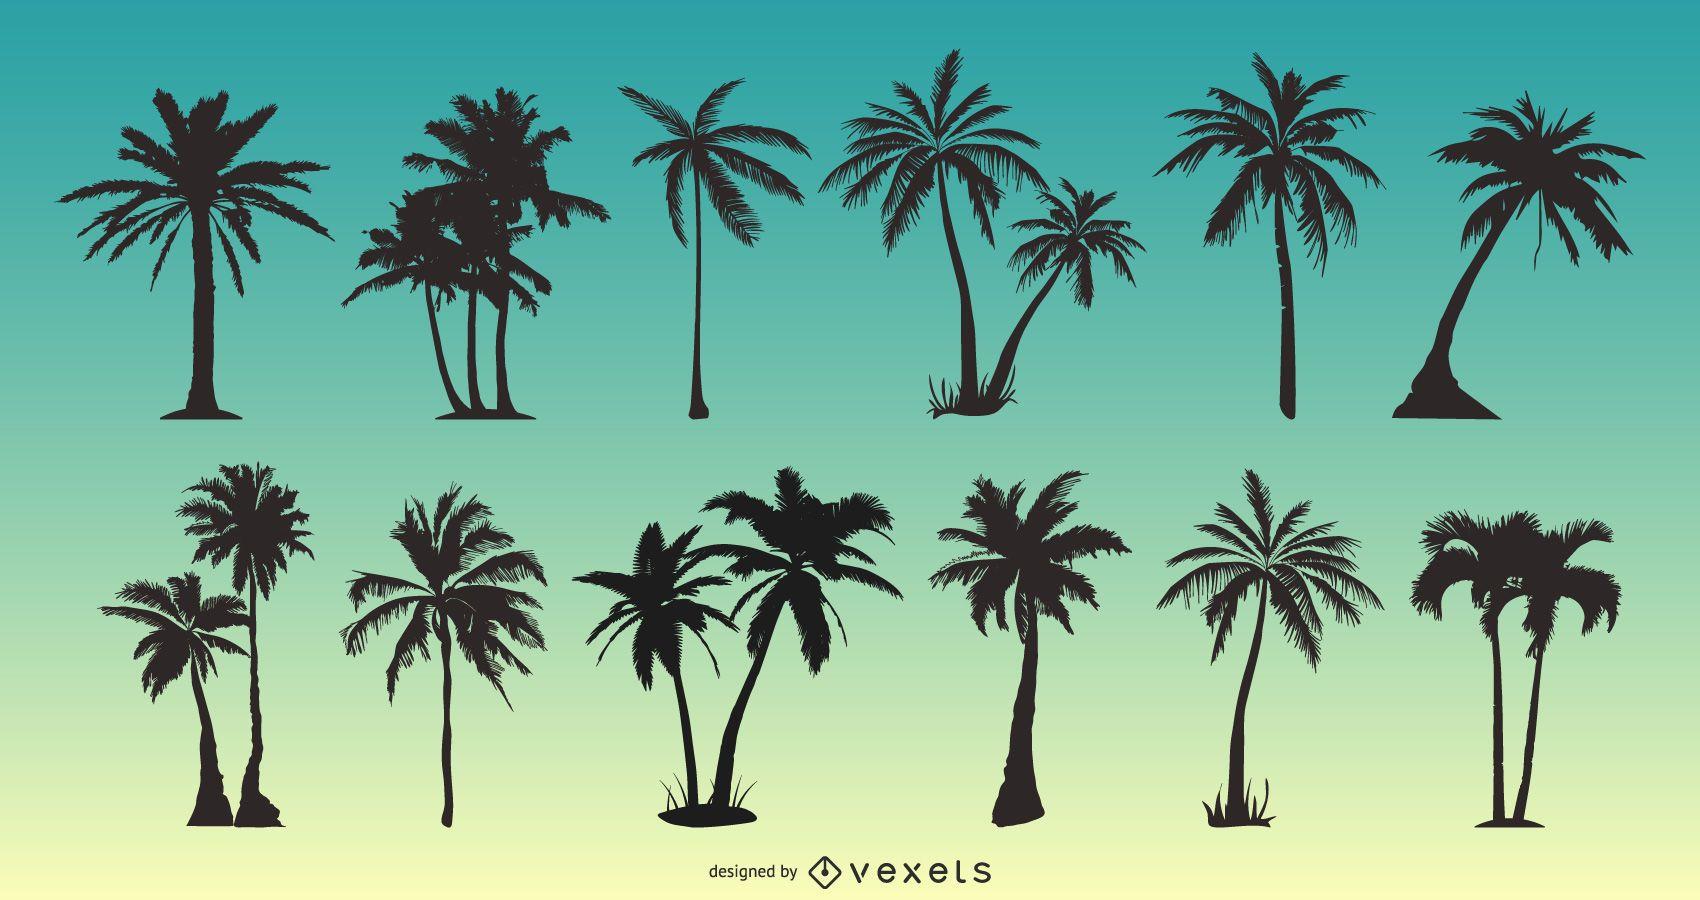 Paquete de silueta de palmera